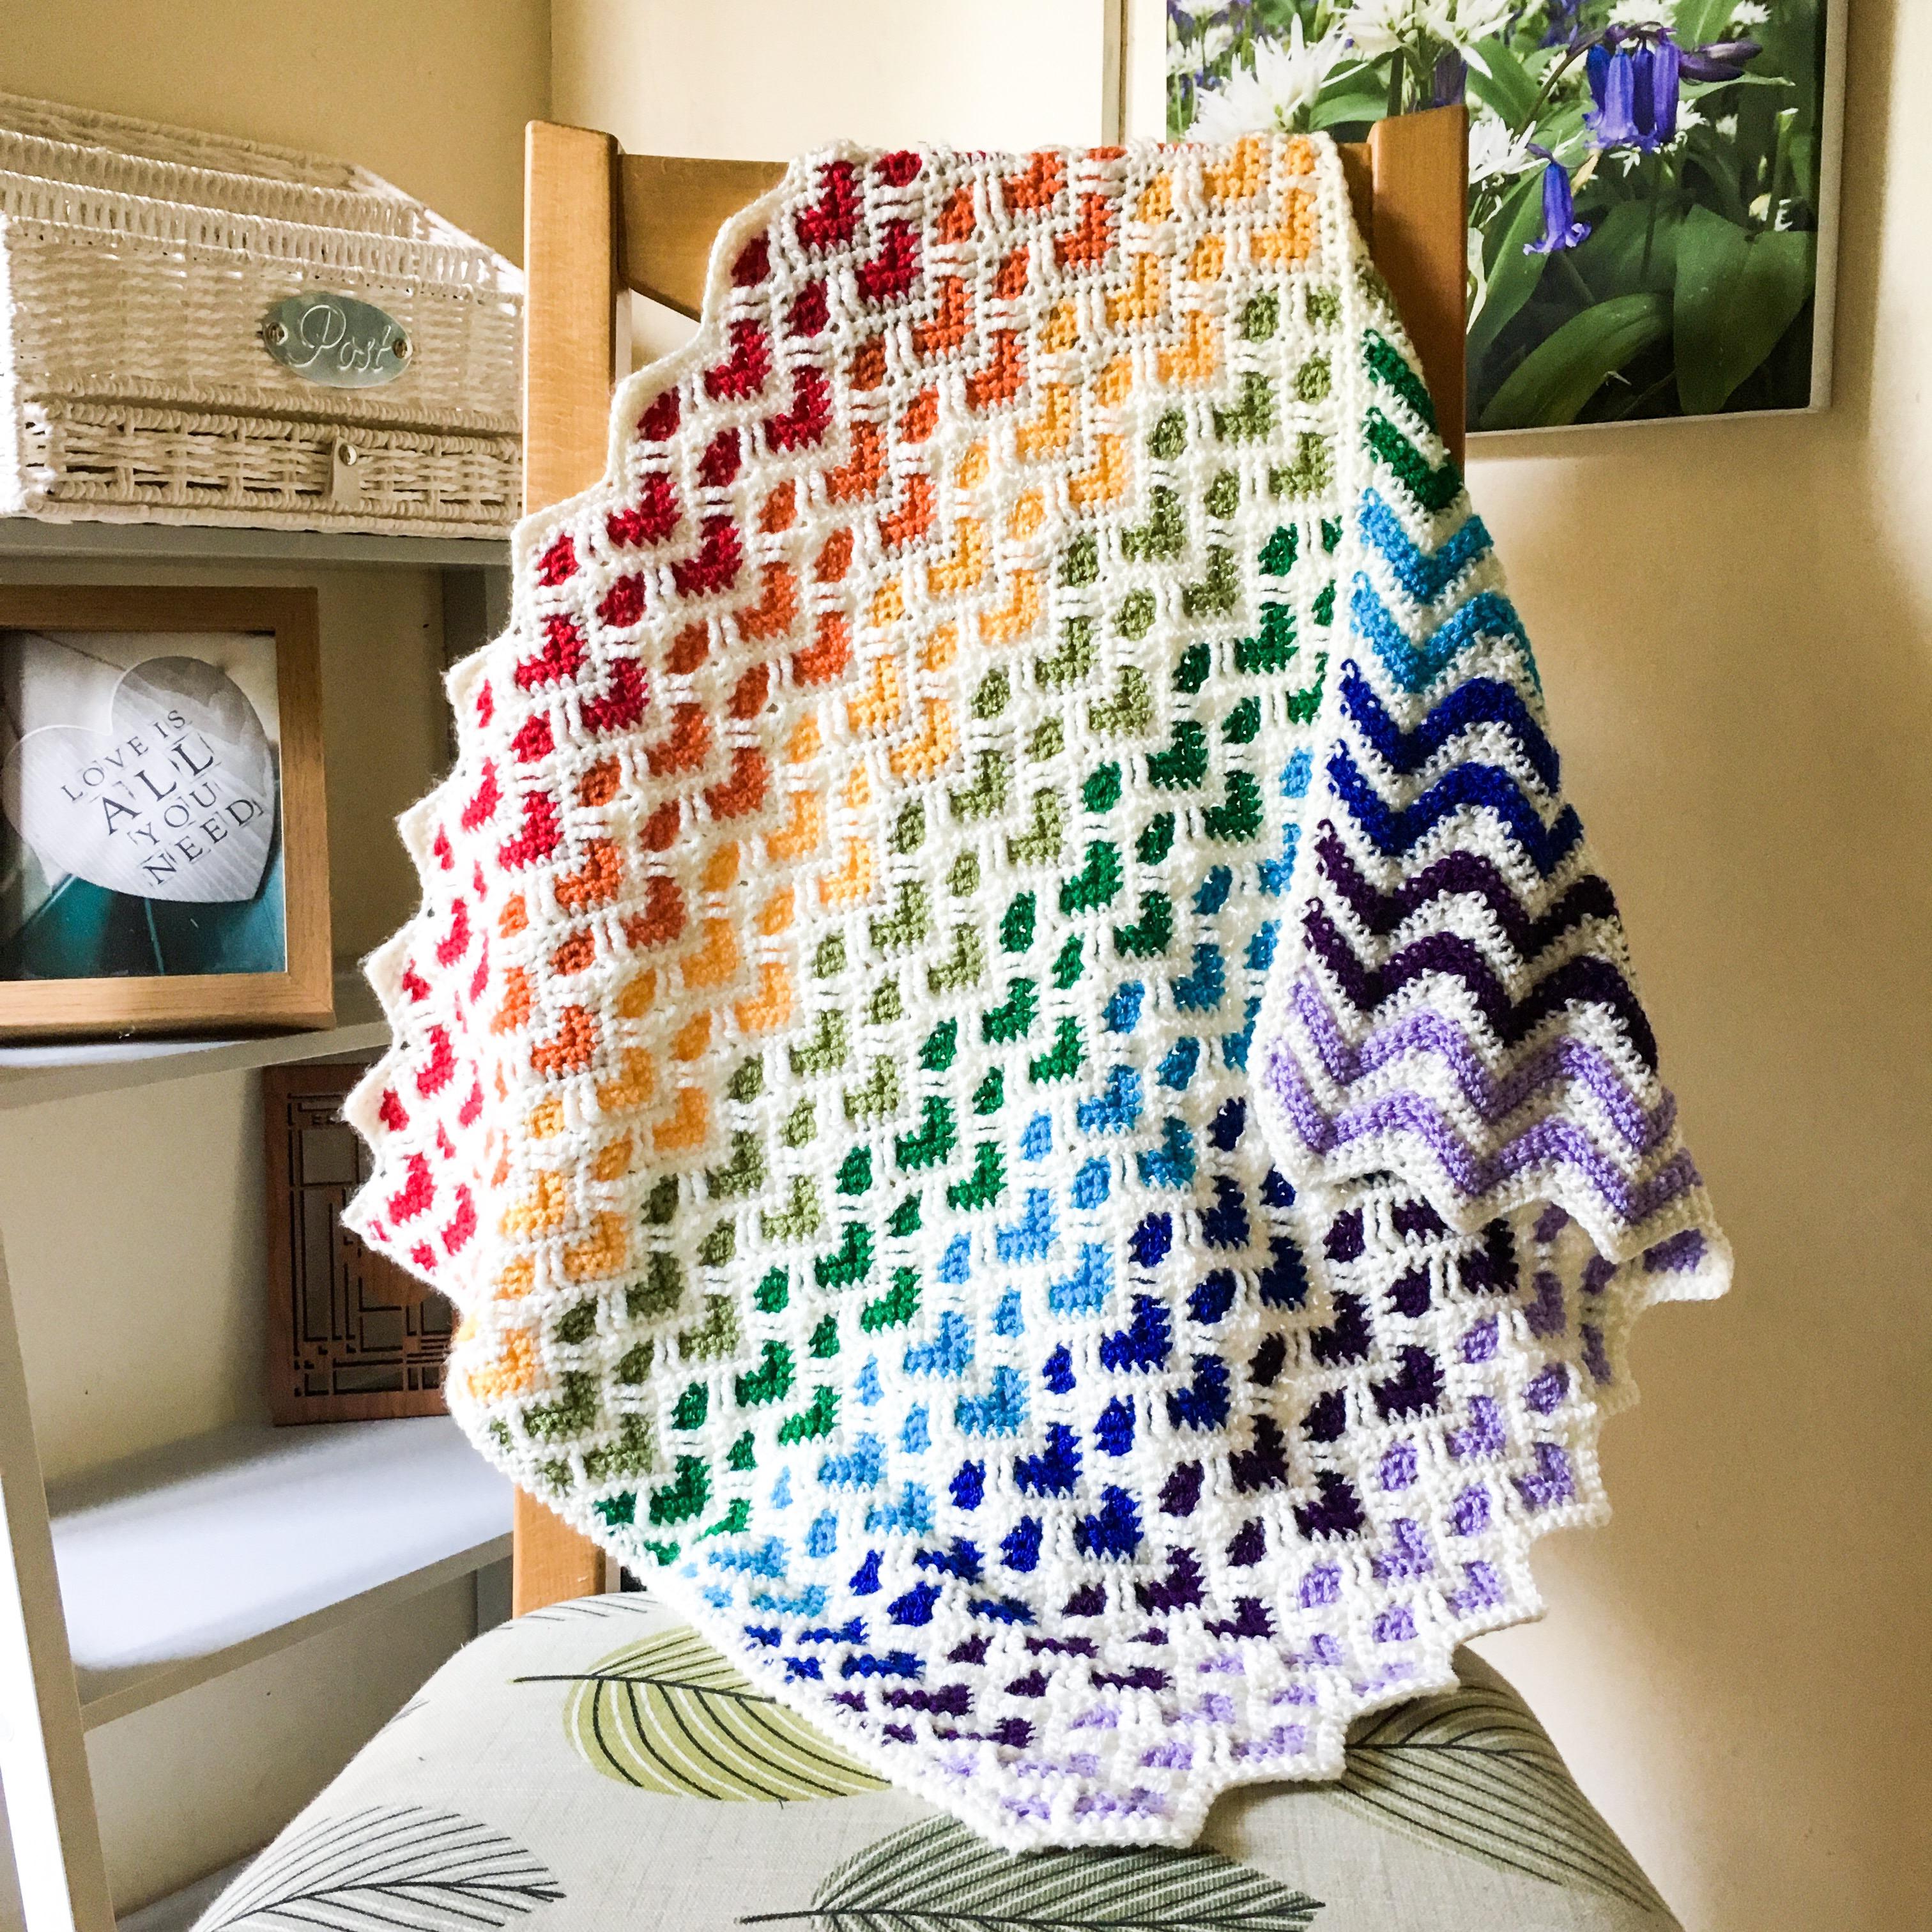 Rainbow Baby Heart Blanket Heart Pattern Car Seat Blanket Reversible Blanket Zig Zag Blanket Twinkly Knits